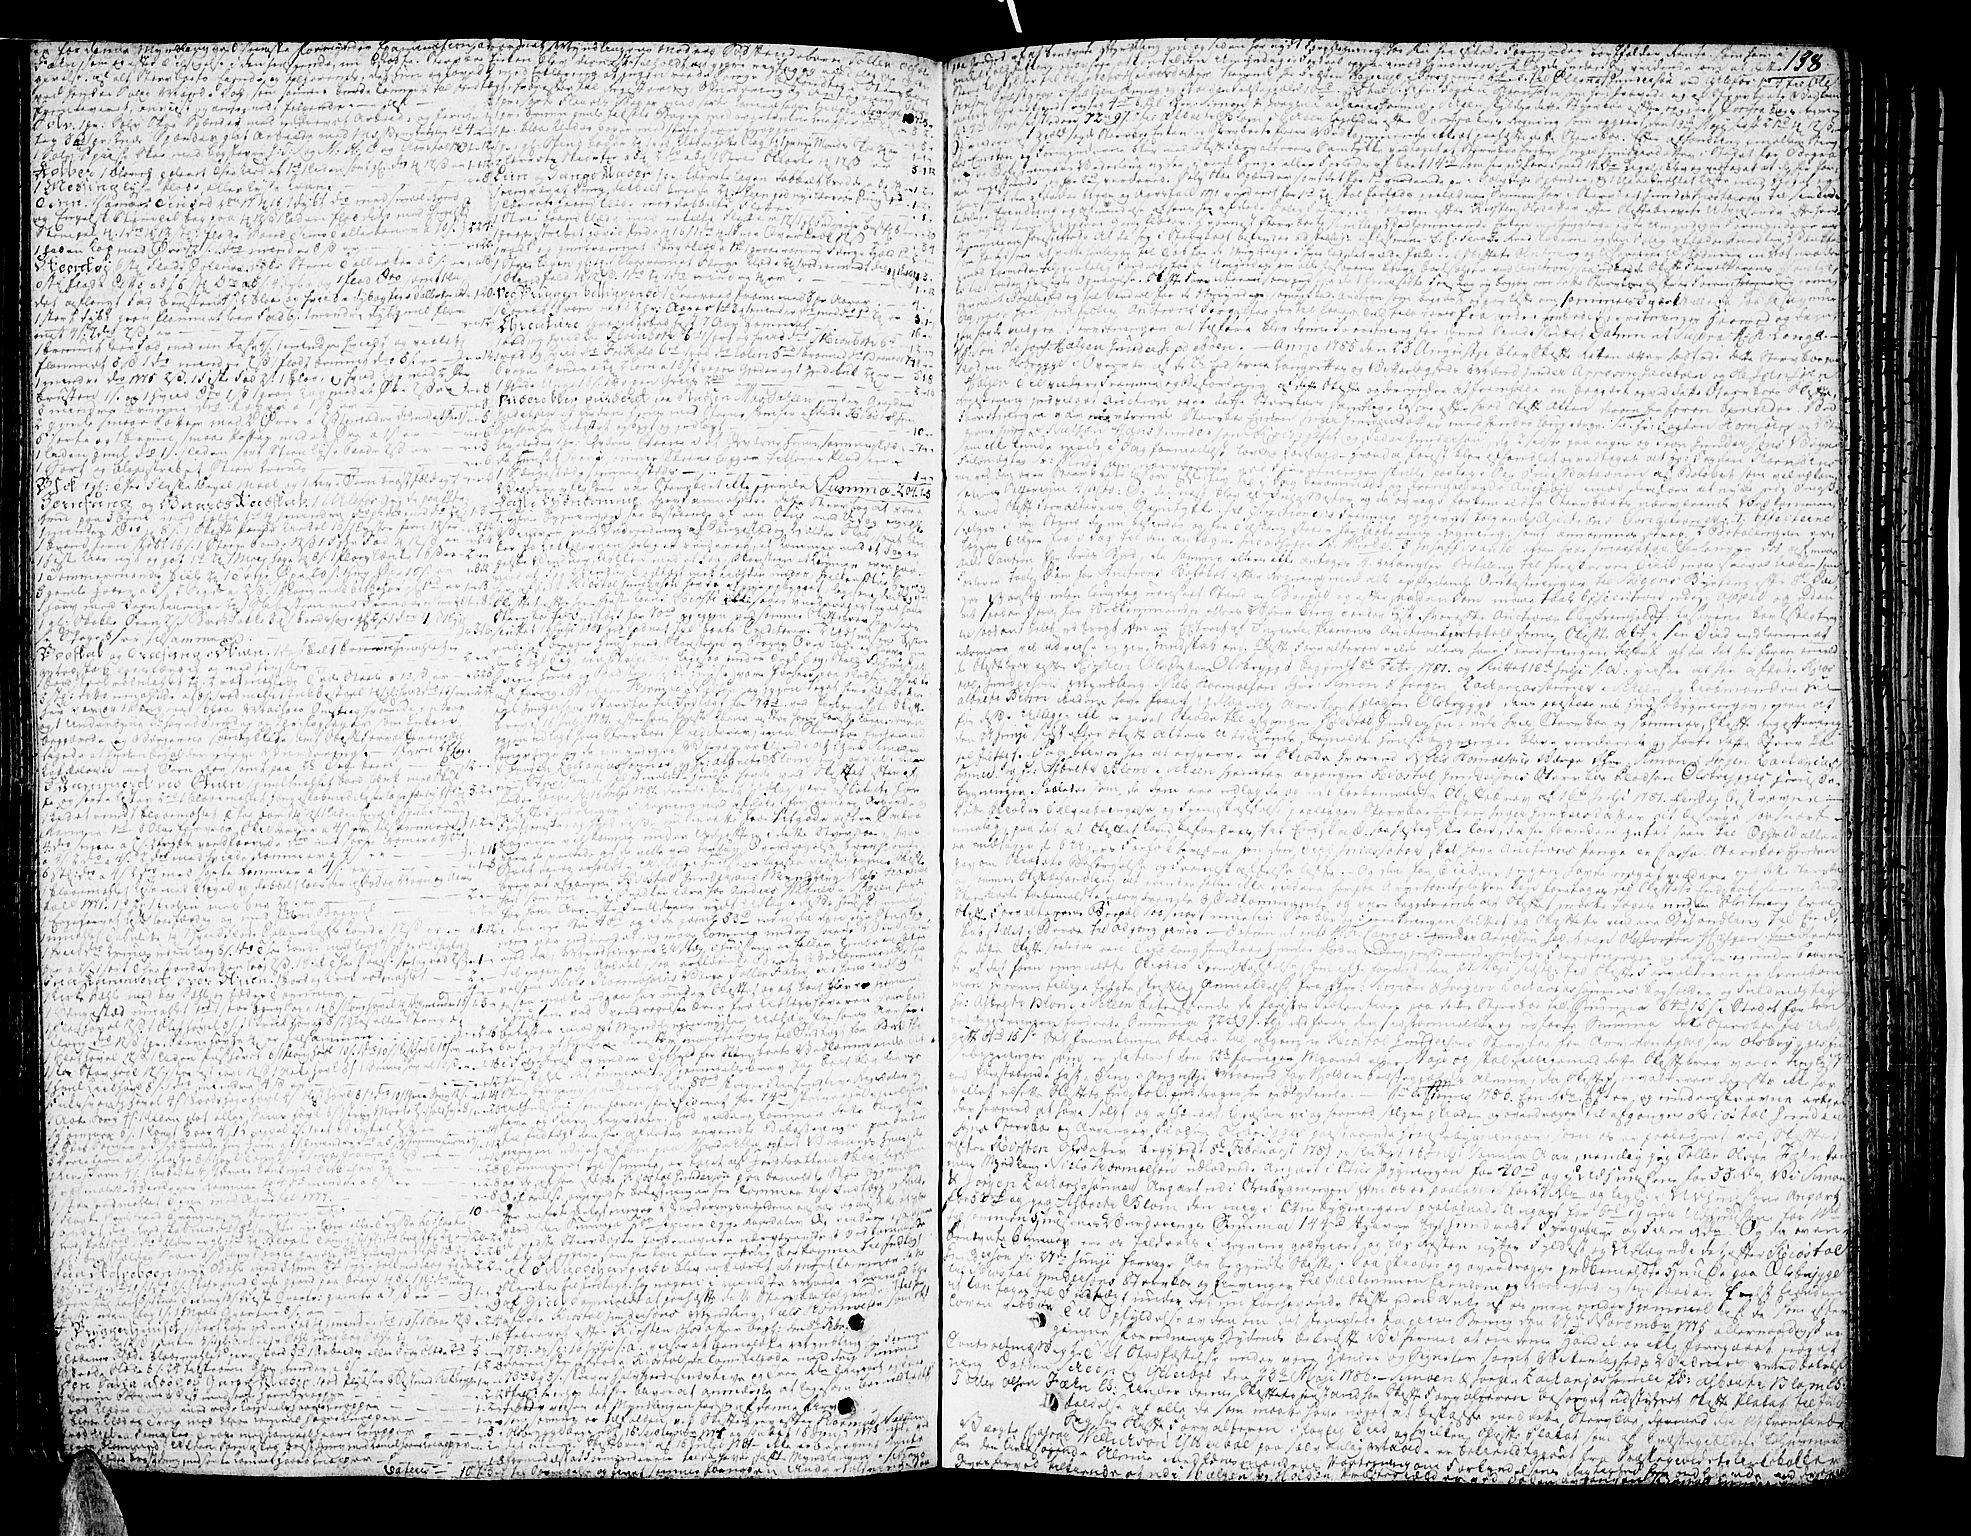 SAKO, Nedre Telemark sorenskriveri, H/Hb/Hba/L0016a: Skifteprotokoll, 1785-1792, s. 137b-138a